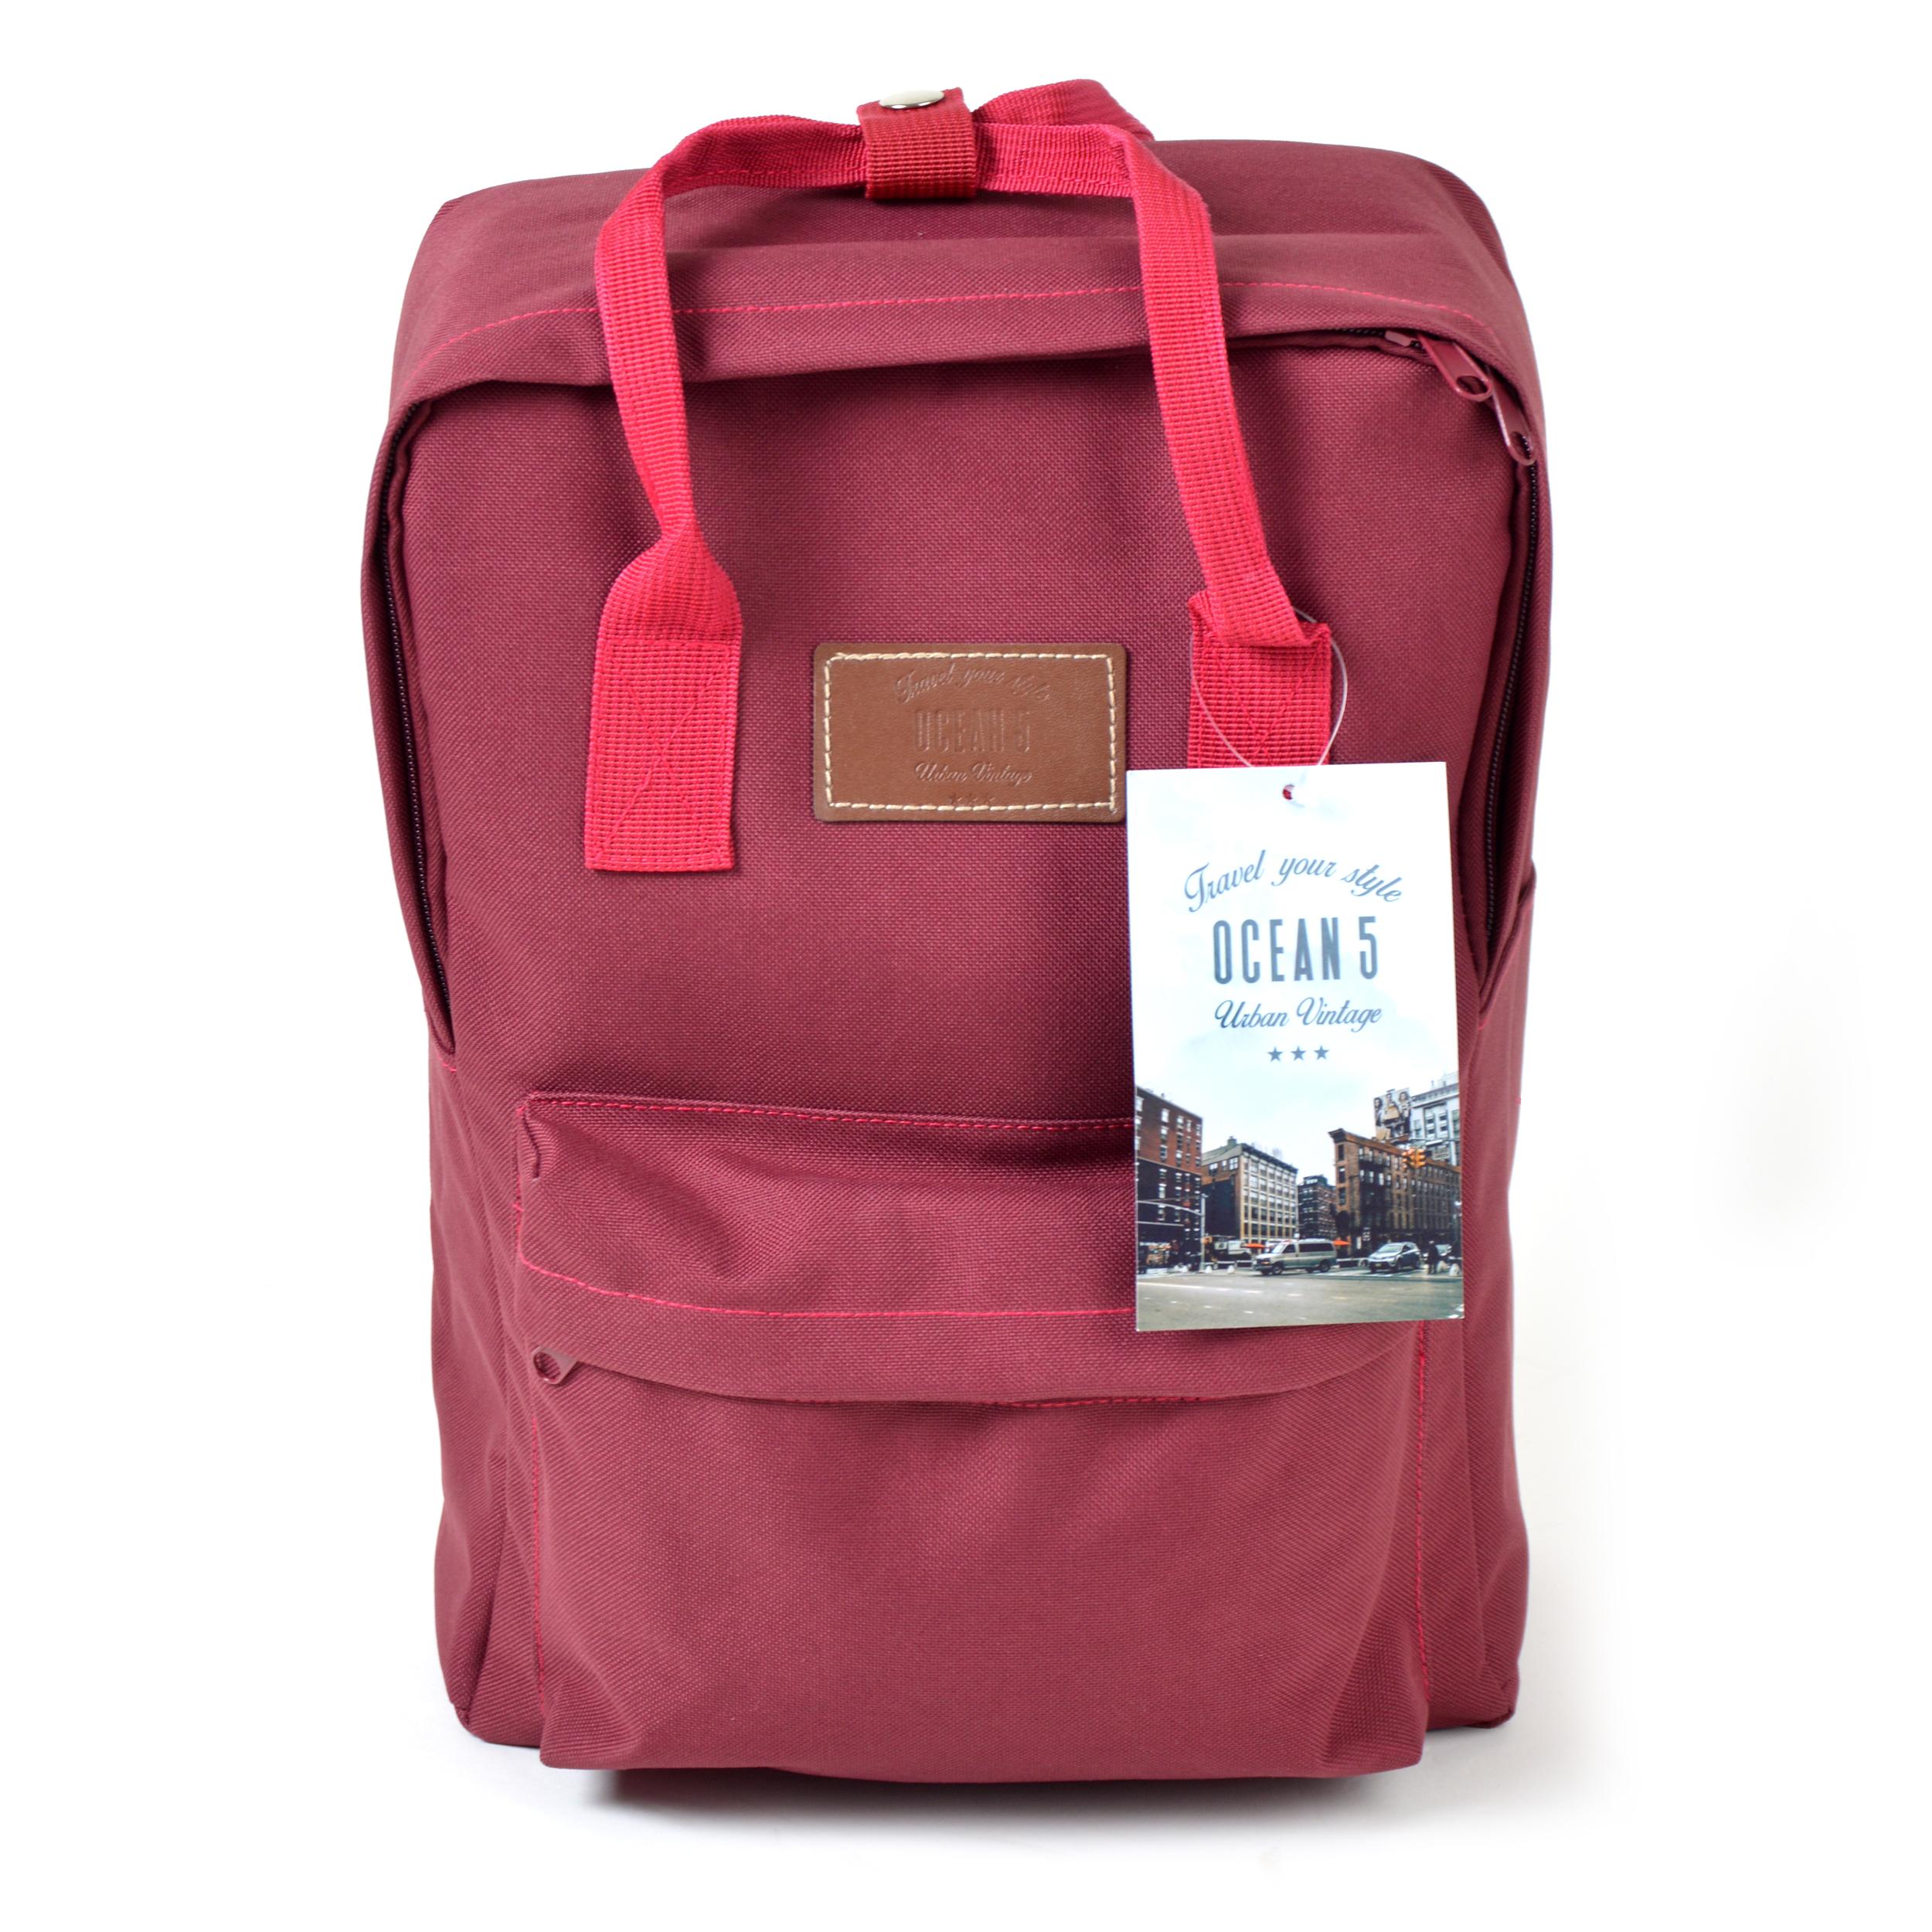 Rucksack Vancouver - Mini-Rucksack Farbe: Rot